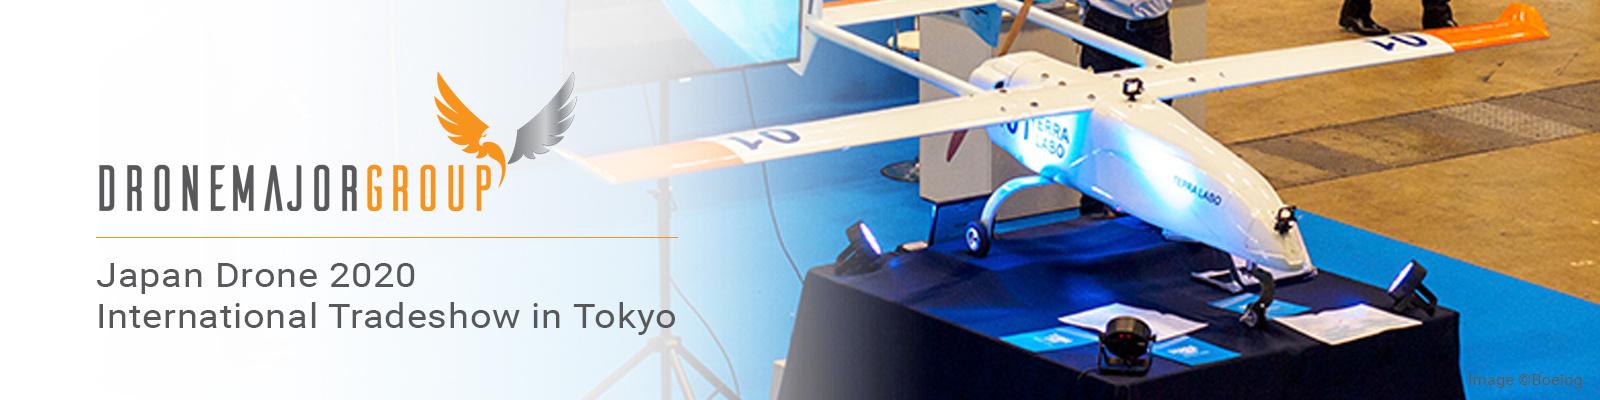 JAPAN DRONE 2020 (International Tradeshow in Tokyo)